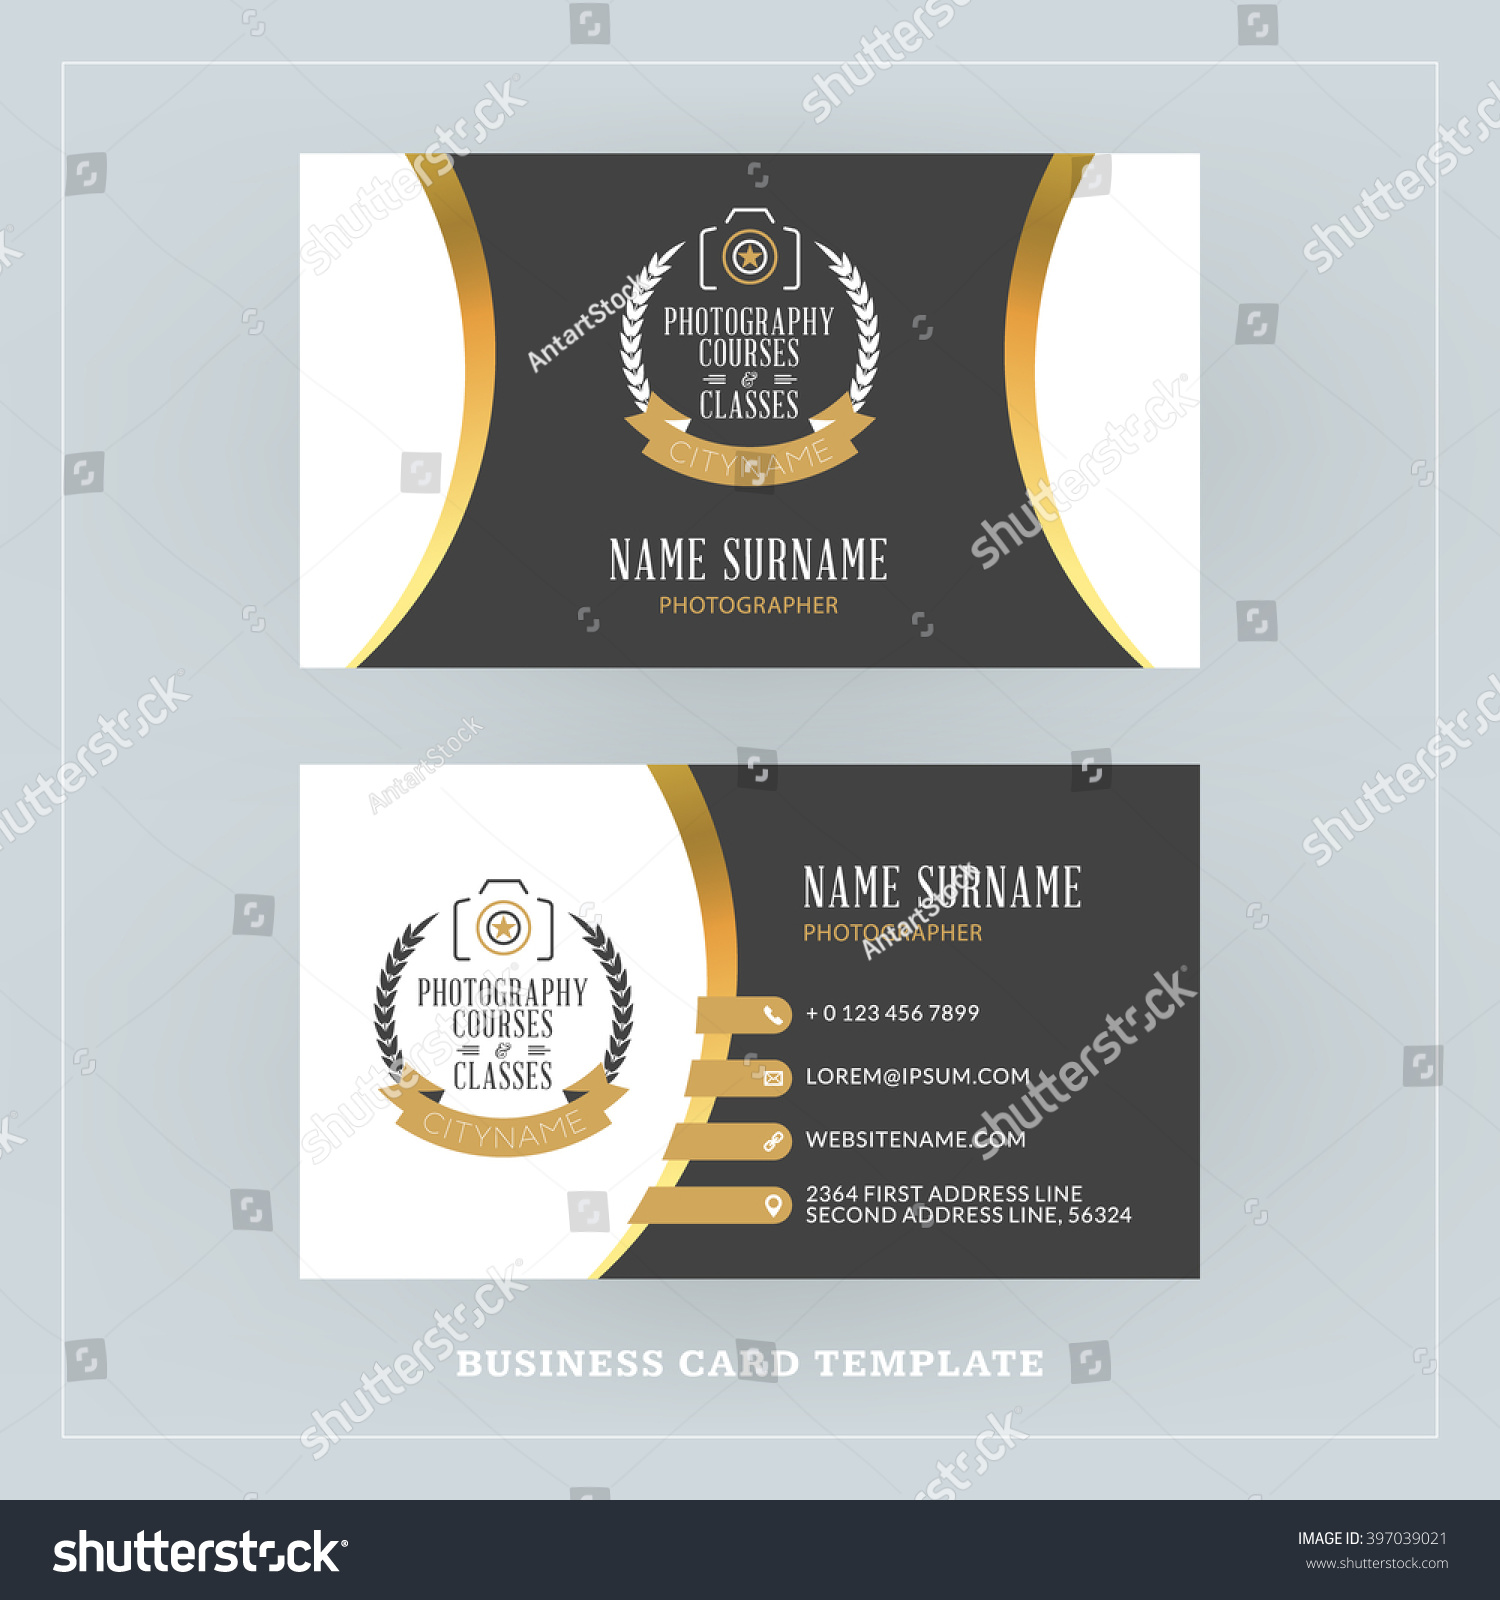 Golden Black Business Card Design Template Stock Photo (Photo ...